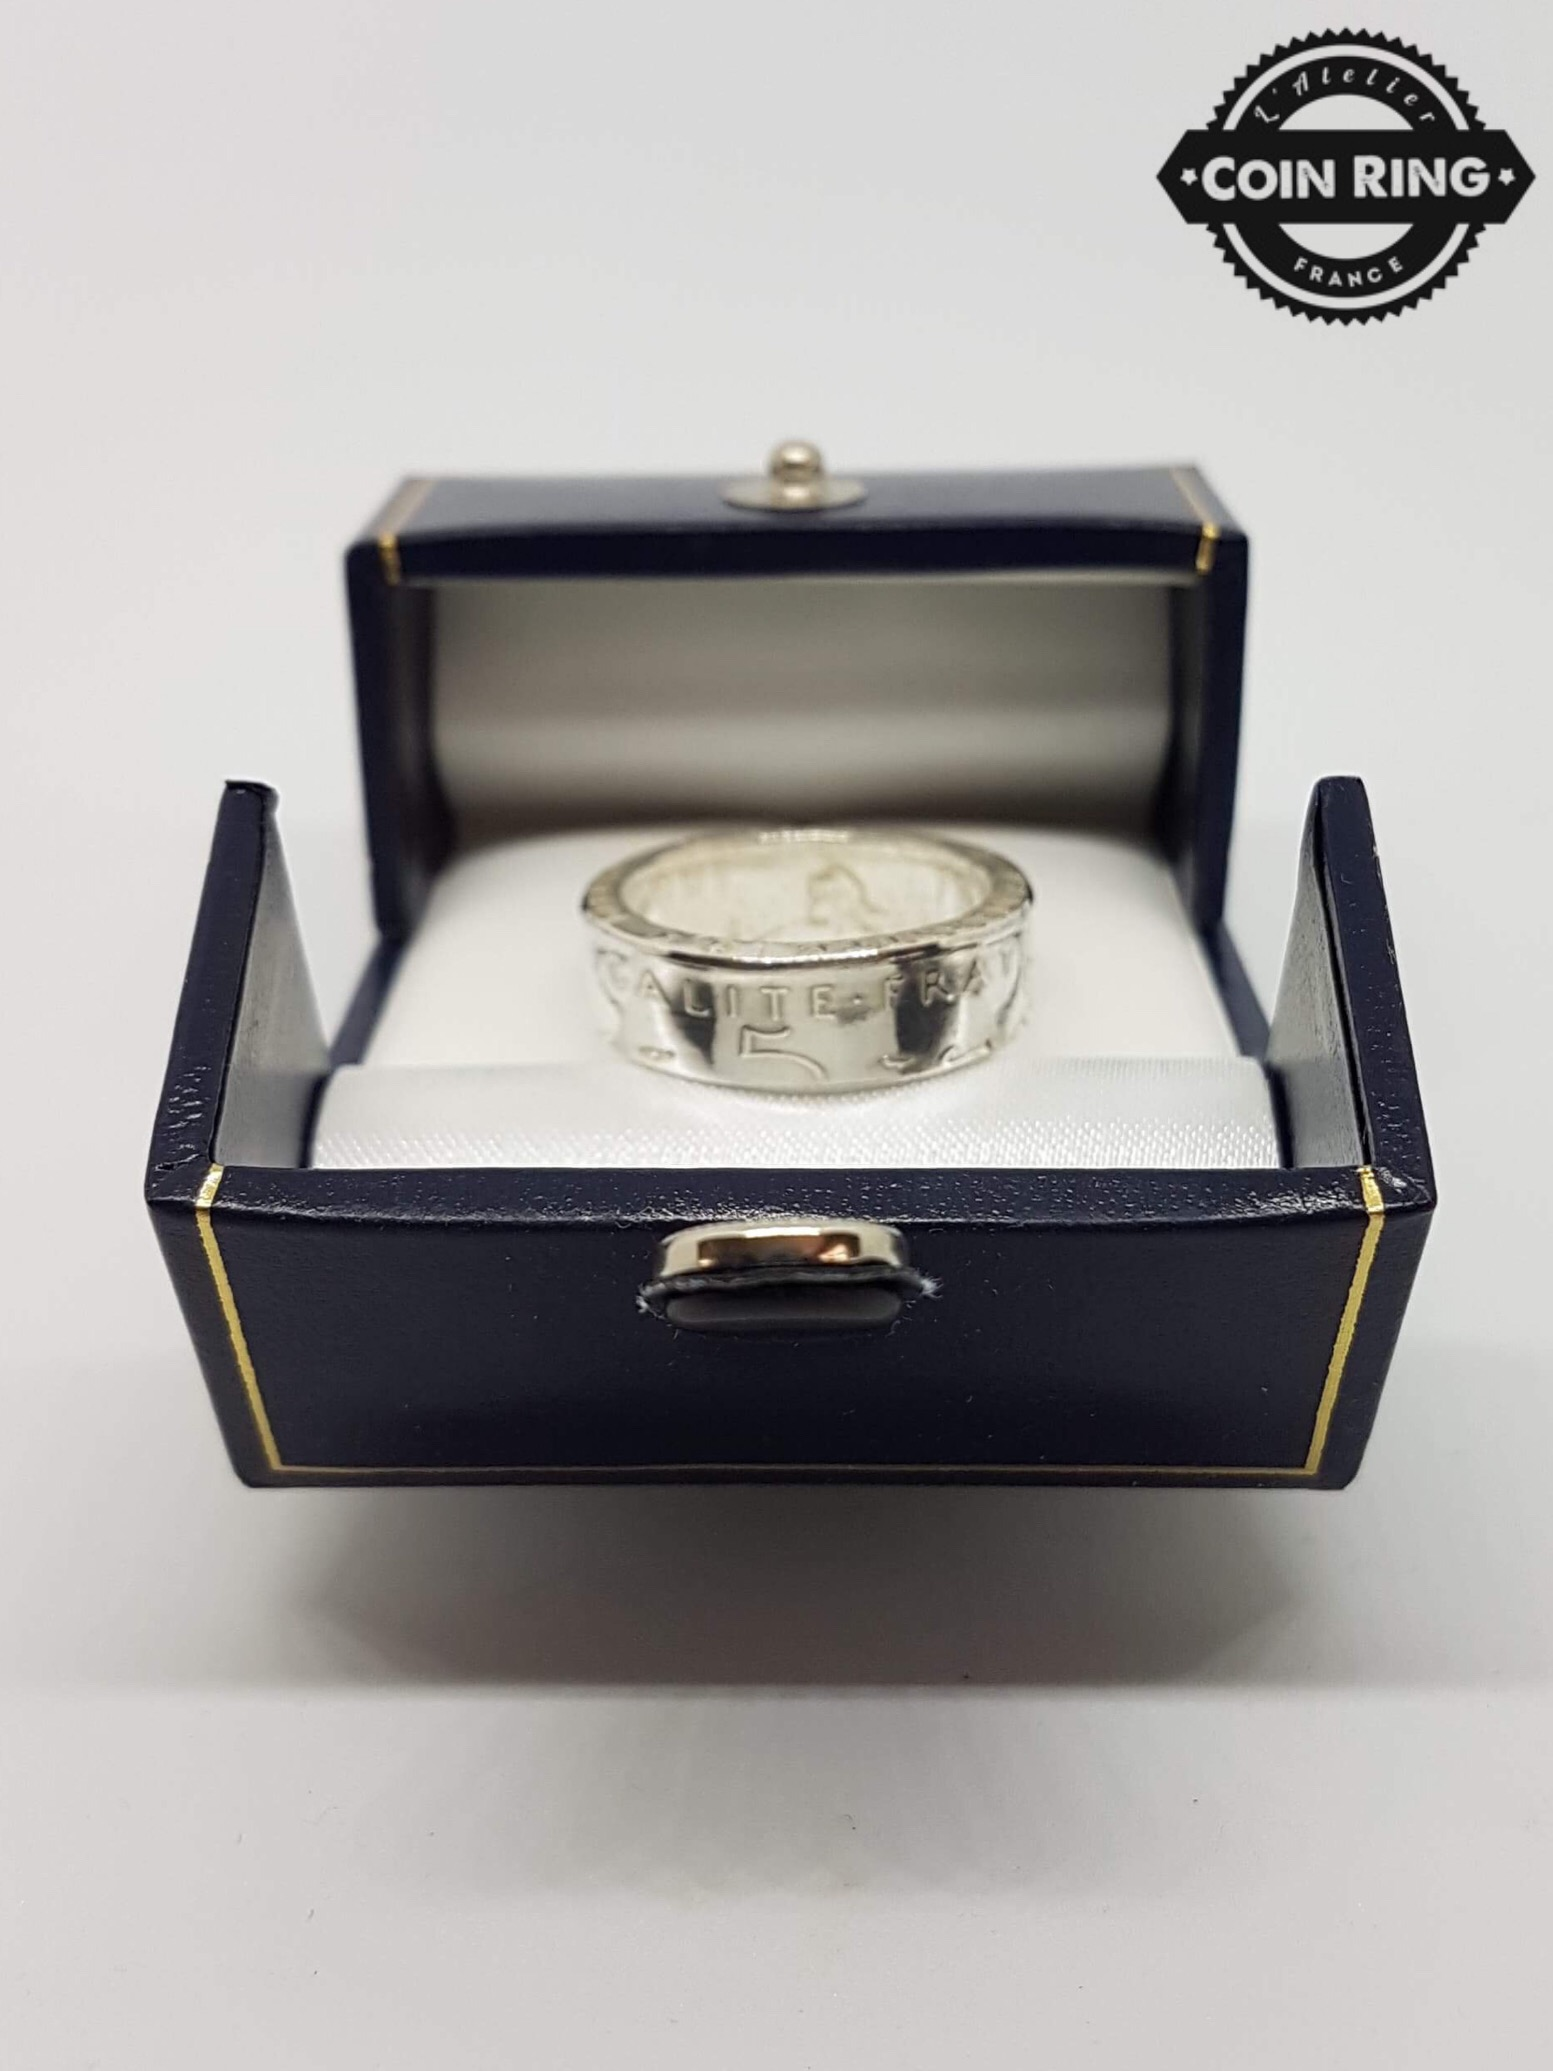 Anneau Coin Ring 5 Francs Semeuse Argent.